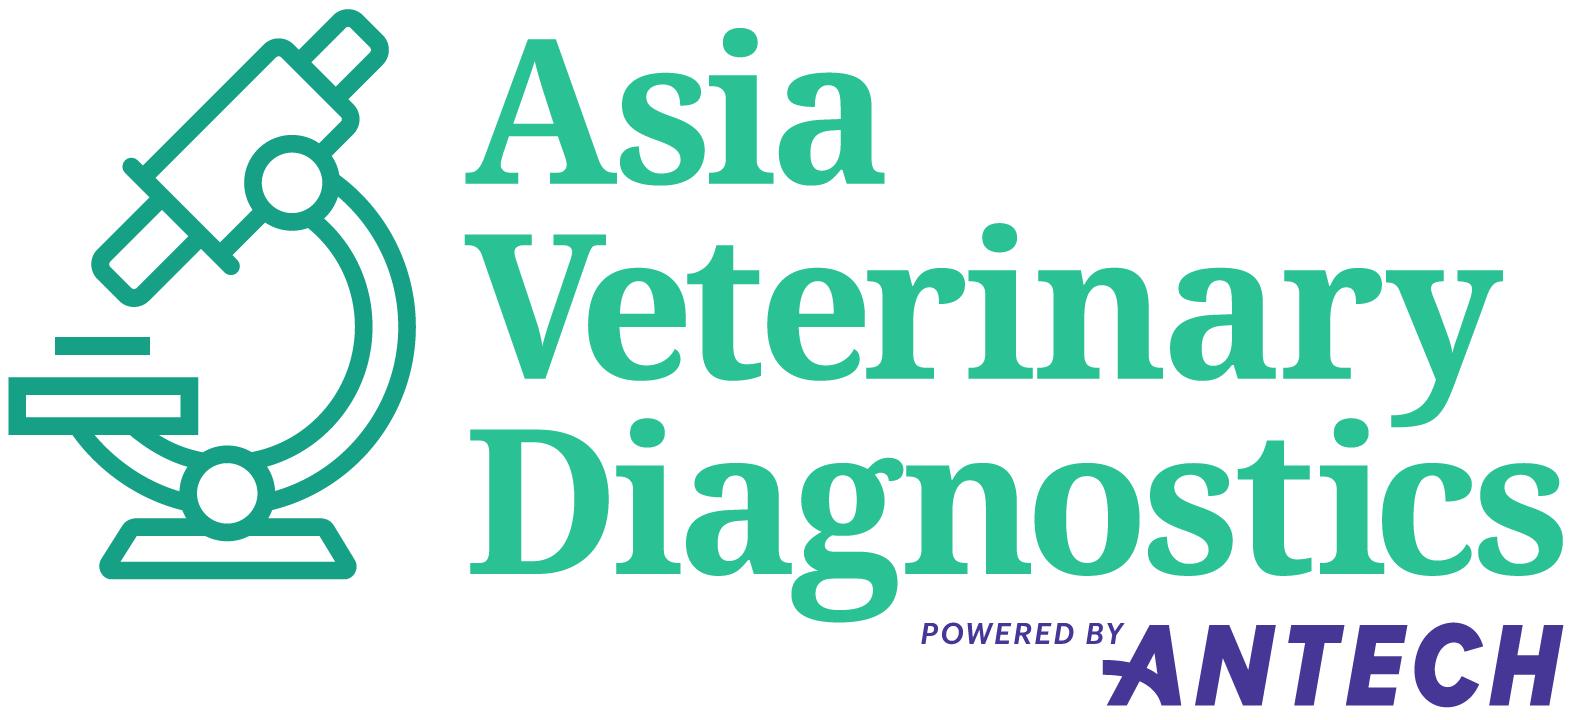 Asia Veterinary Diagnostics